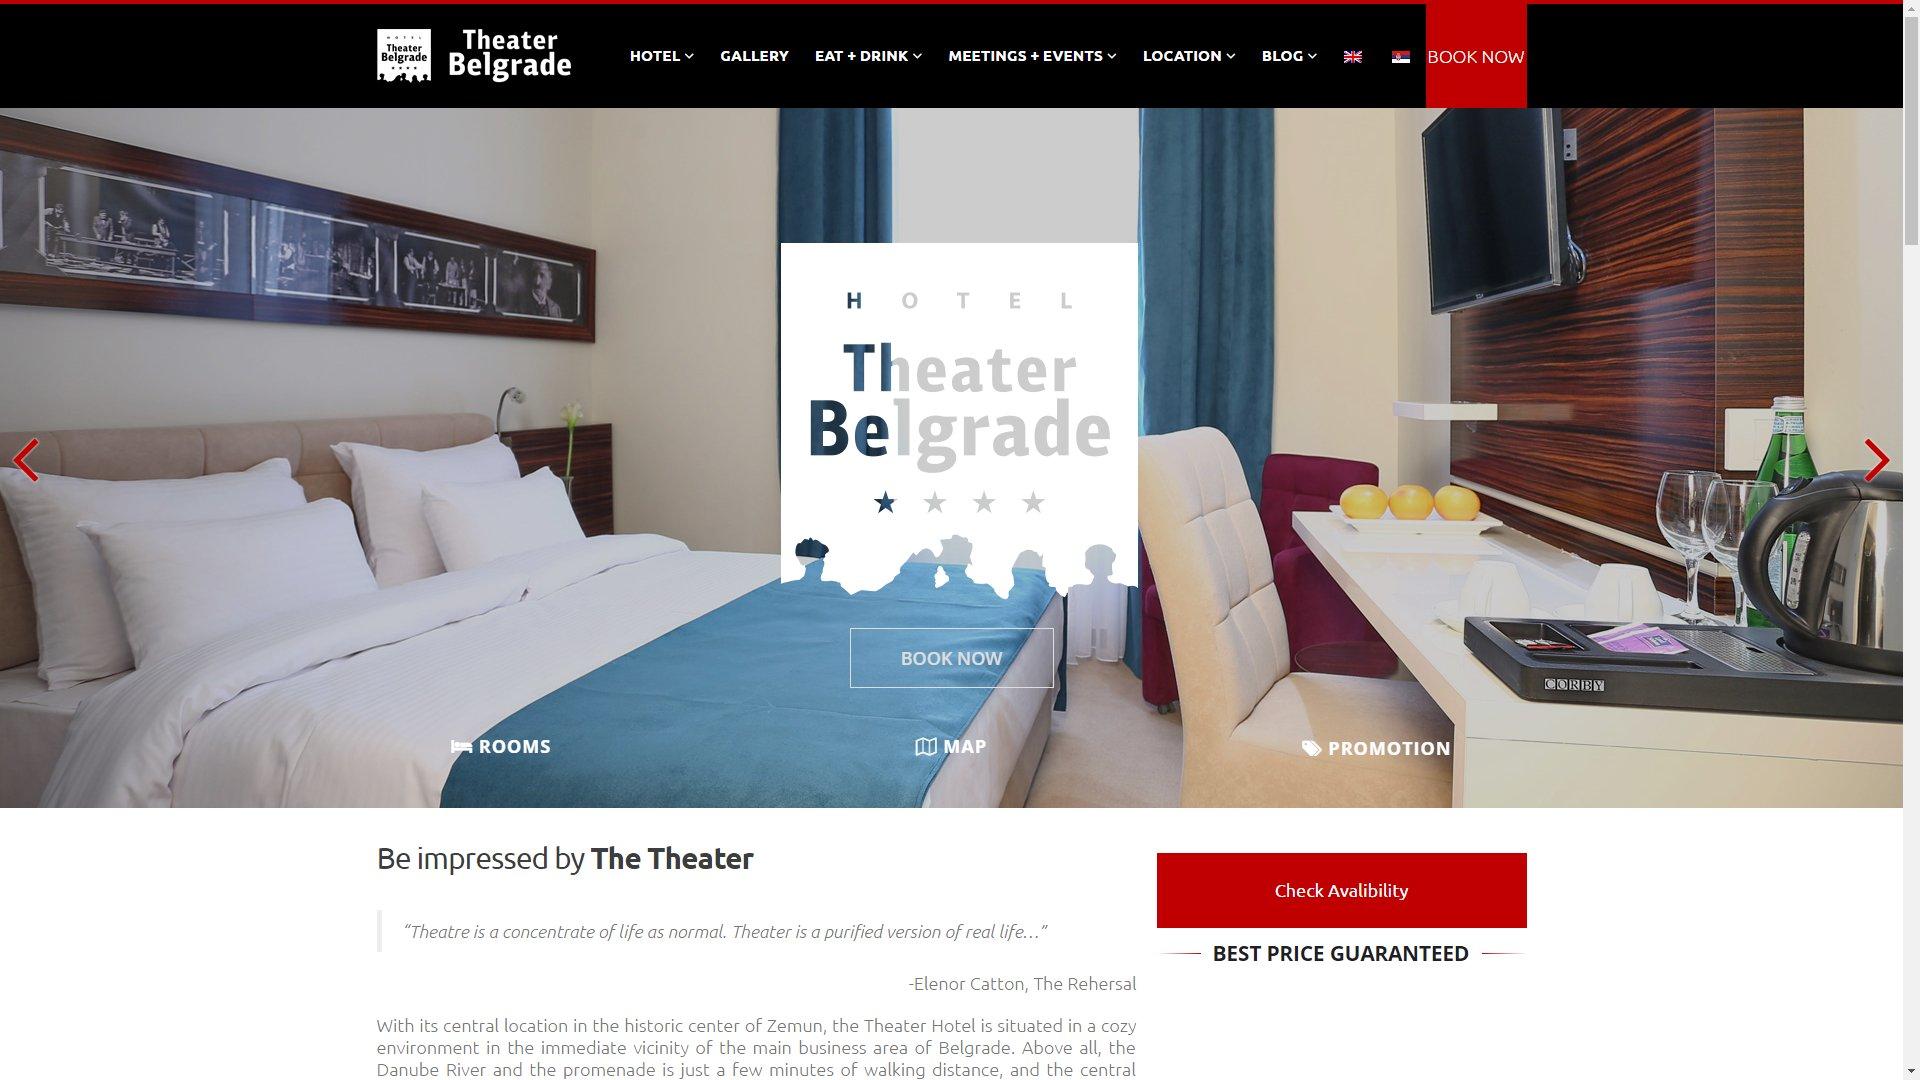 Hotel Theater Belgrade - ss1